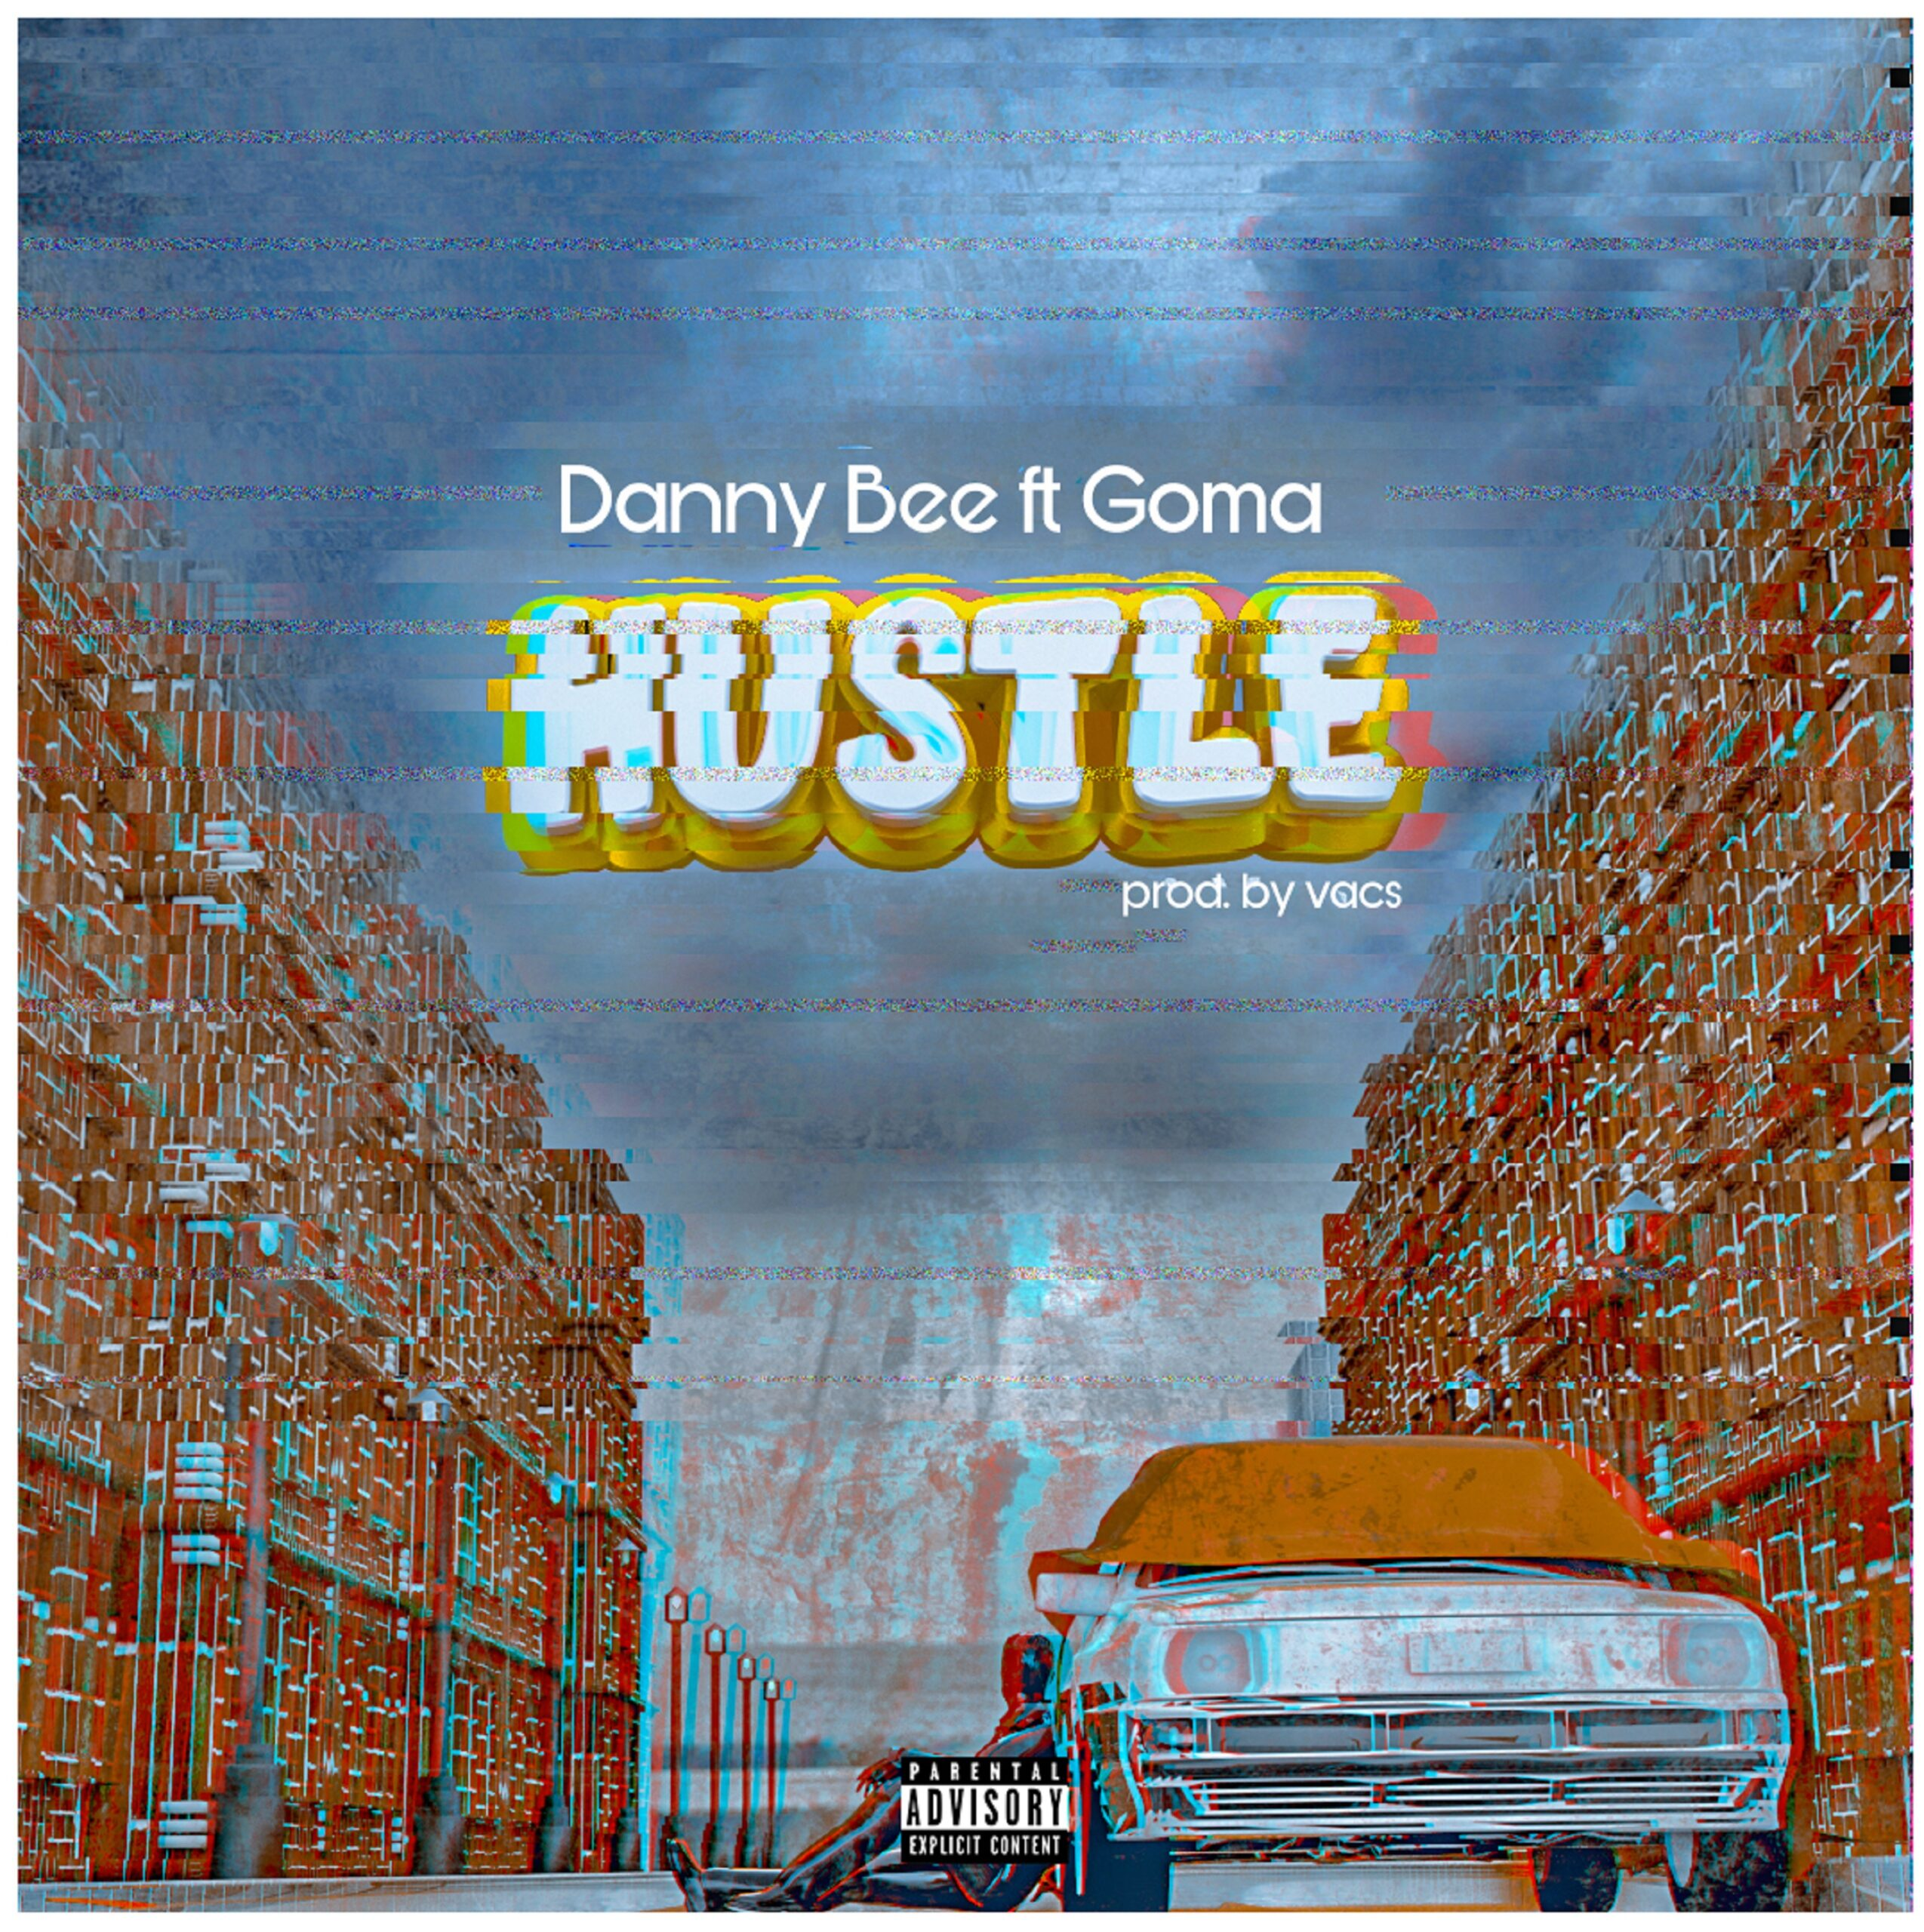 Danny Bee - Hustle